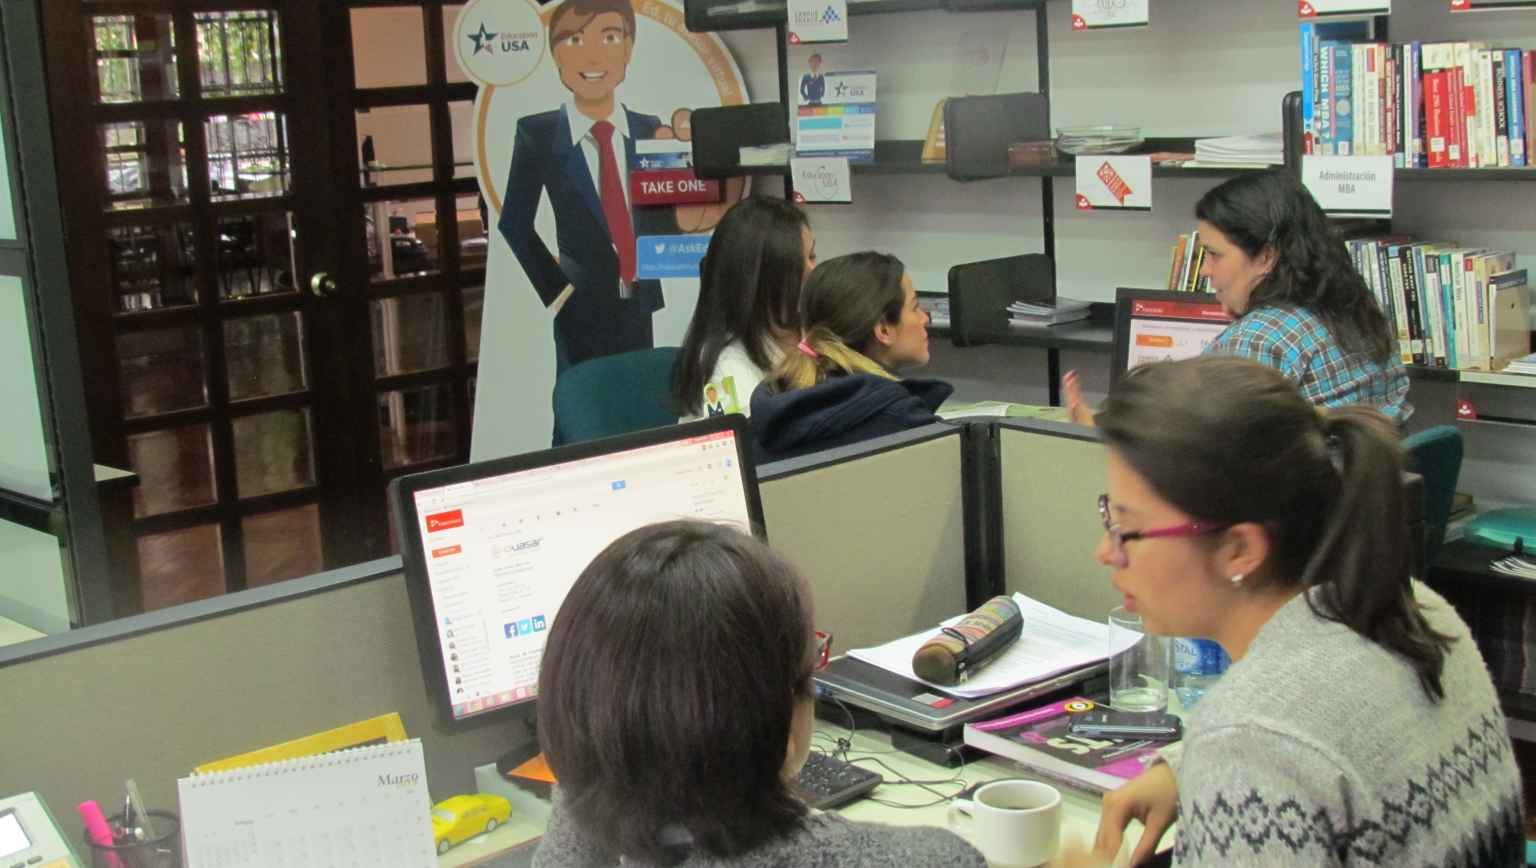 EducationUSA Colfuturo avdising center